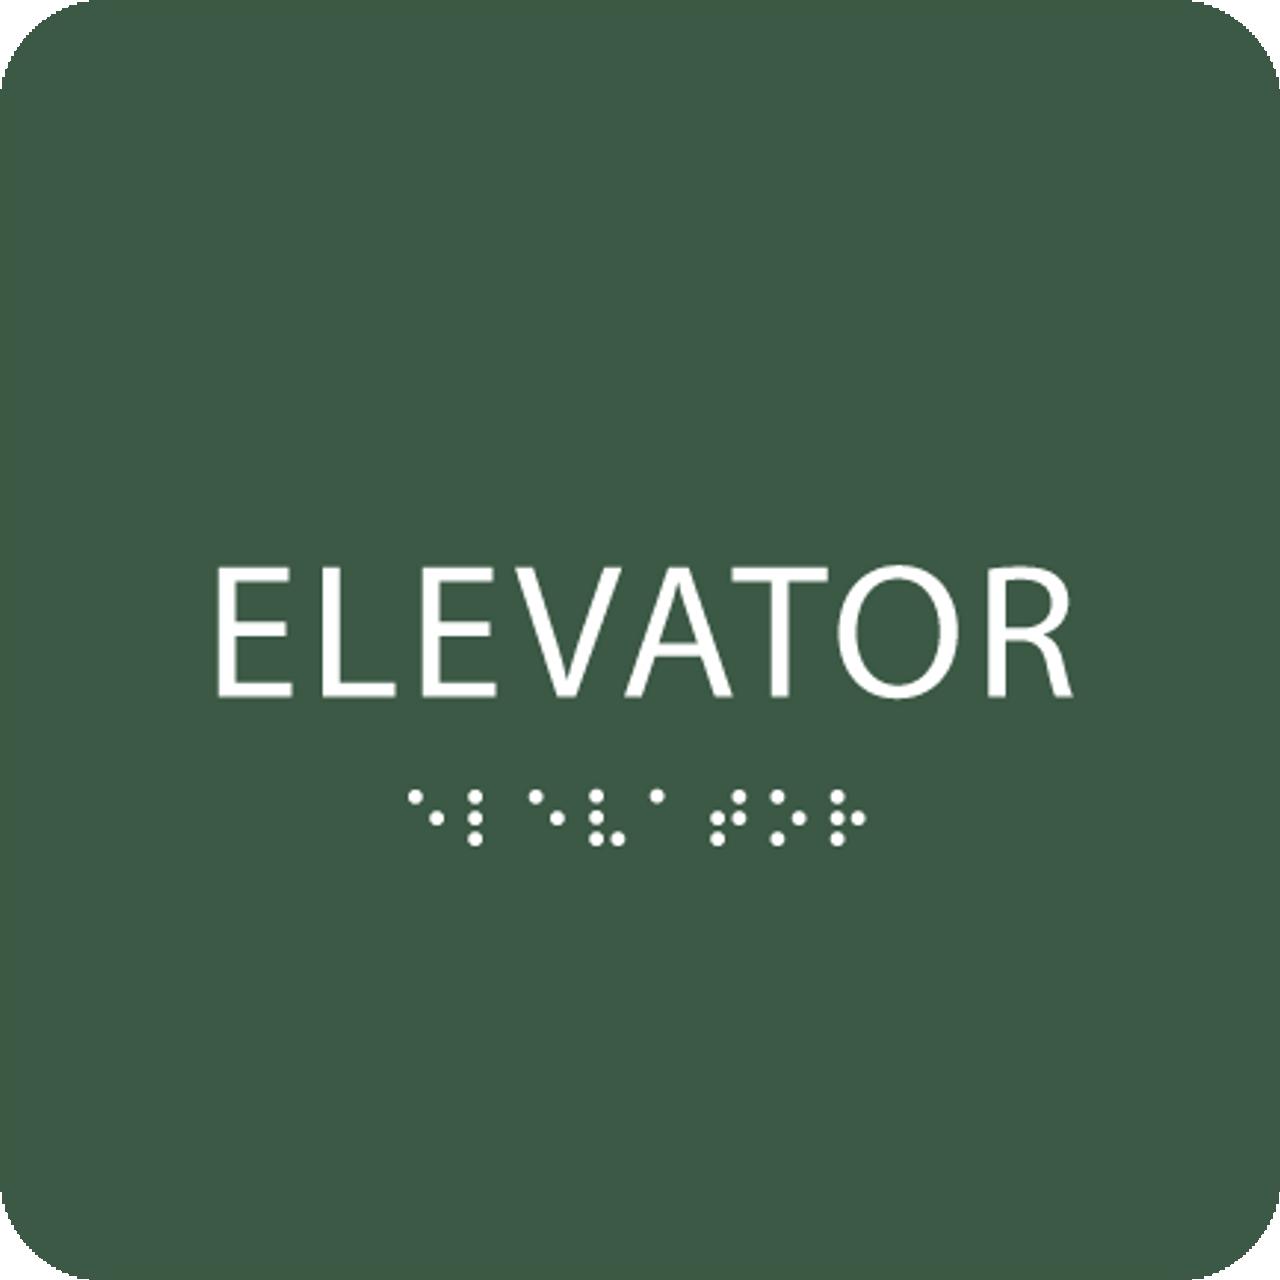 Green ADA Elevator Sign